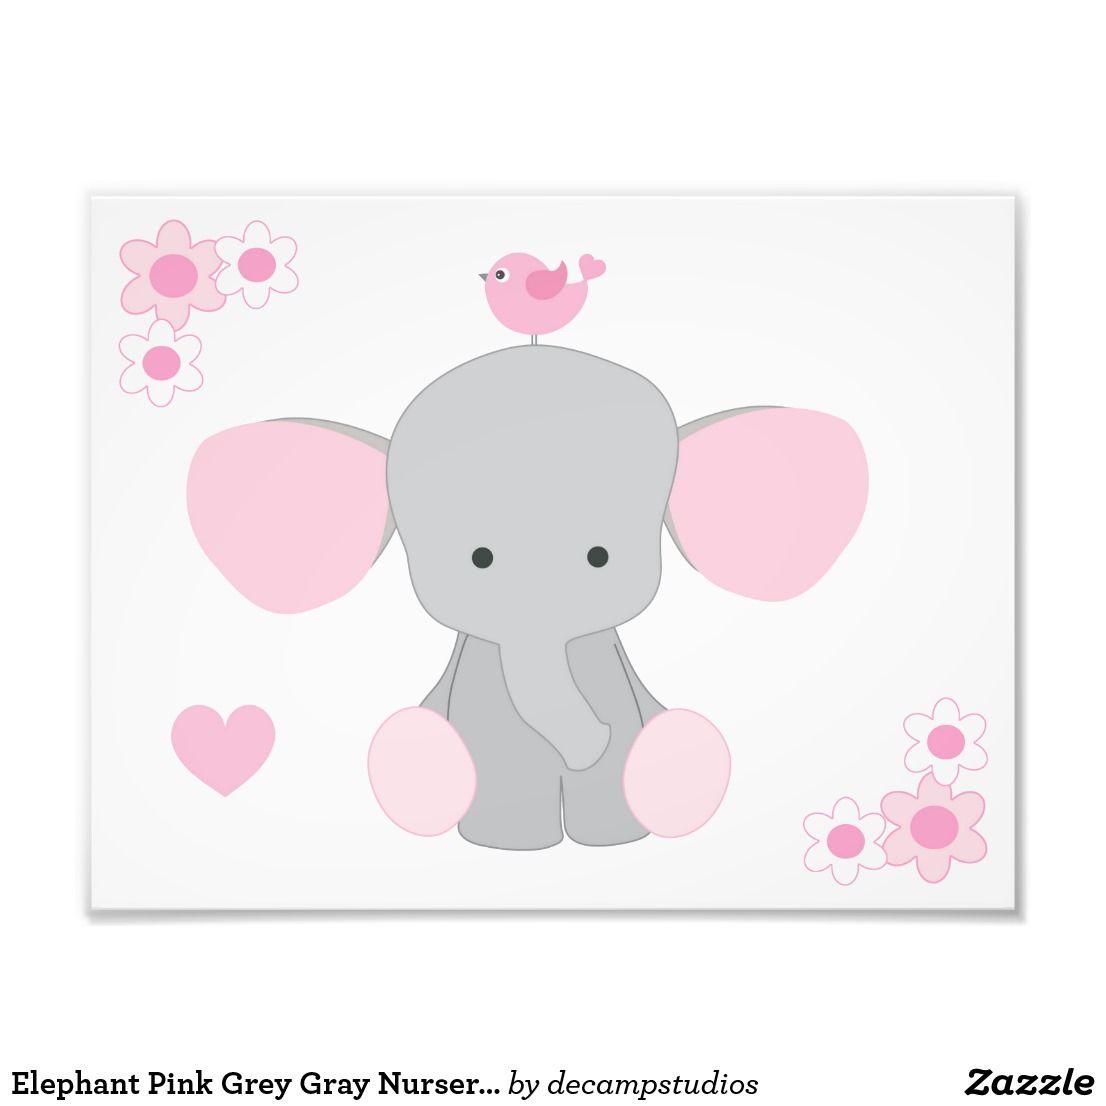 Elephant Pink Grey Gray Nursery Baby Girl Wall Art  sc 1 st  Pinterest & Elephant Pink Grey Gray Nursery Baby Girl Wall Art | Nurseries baby ...